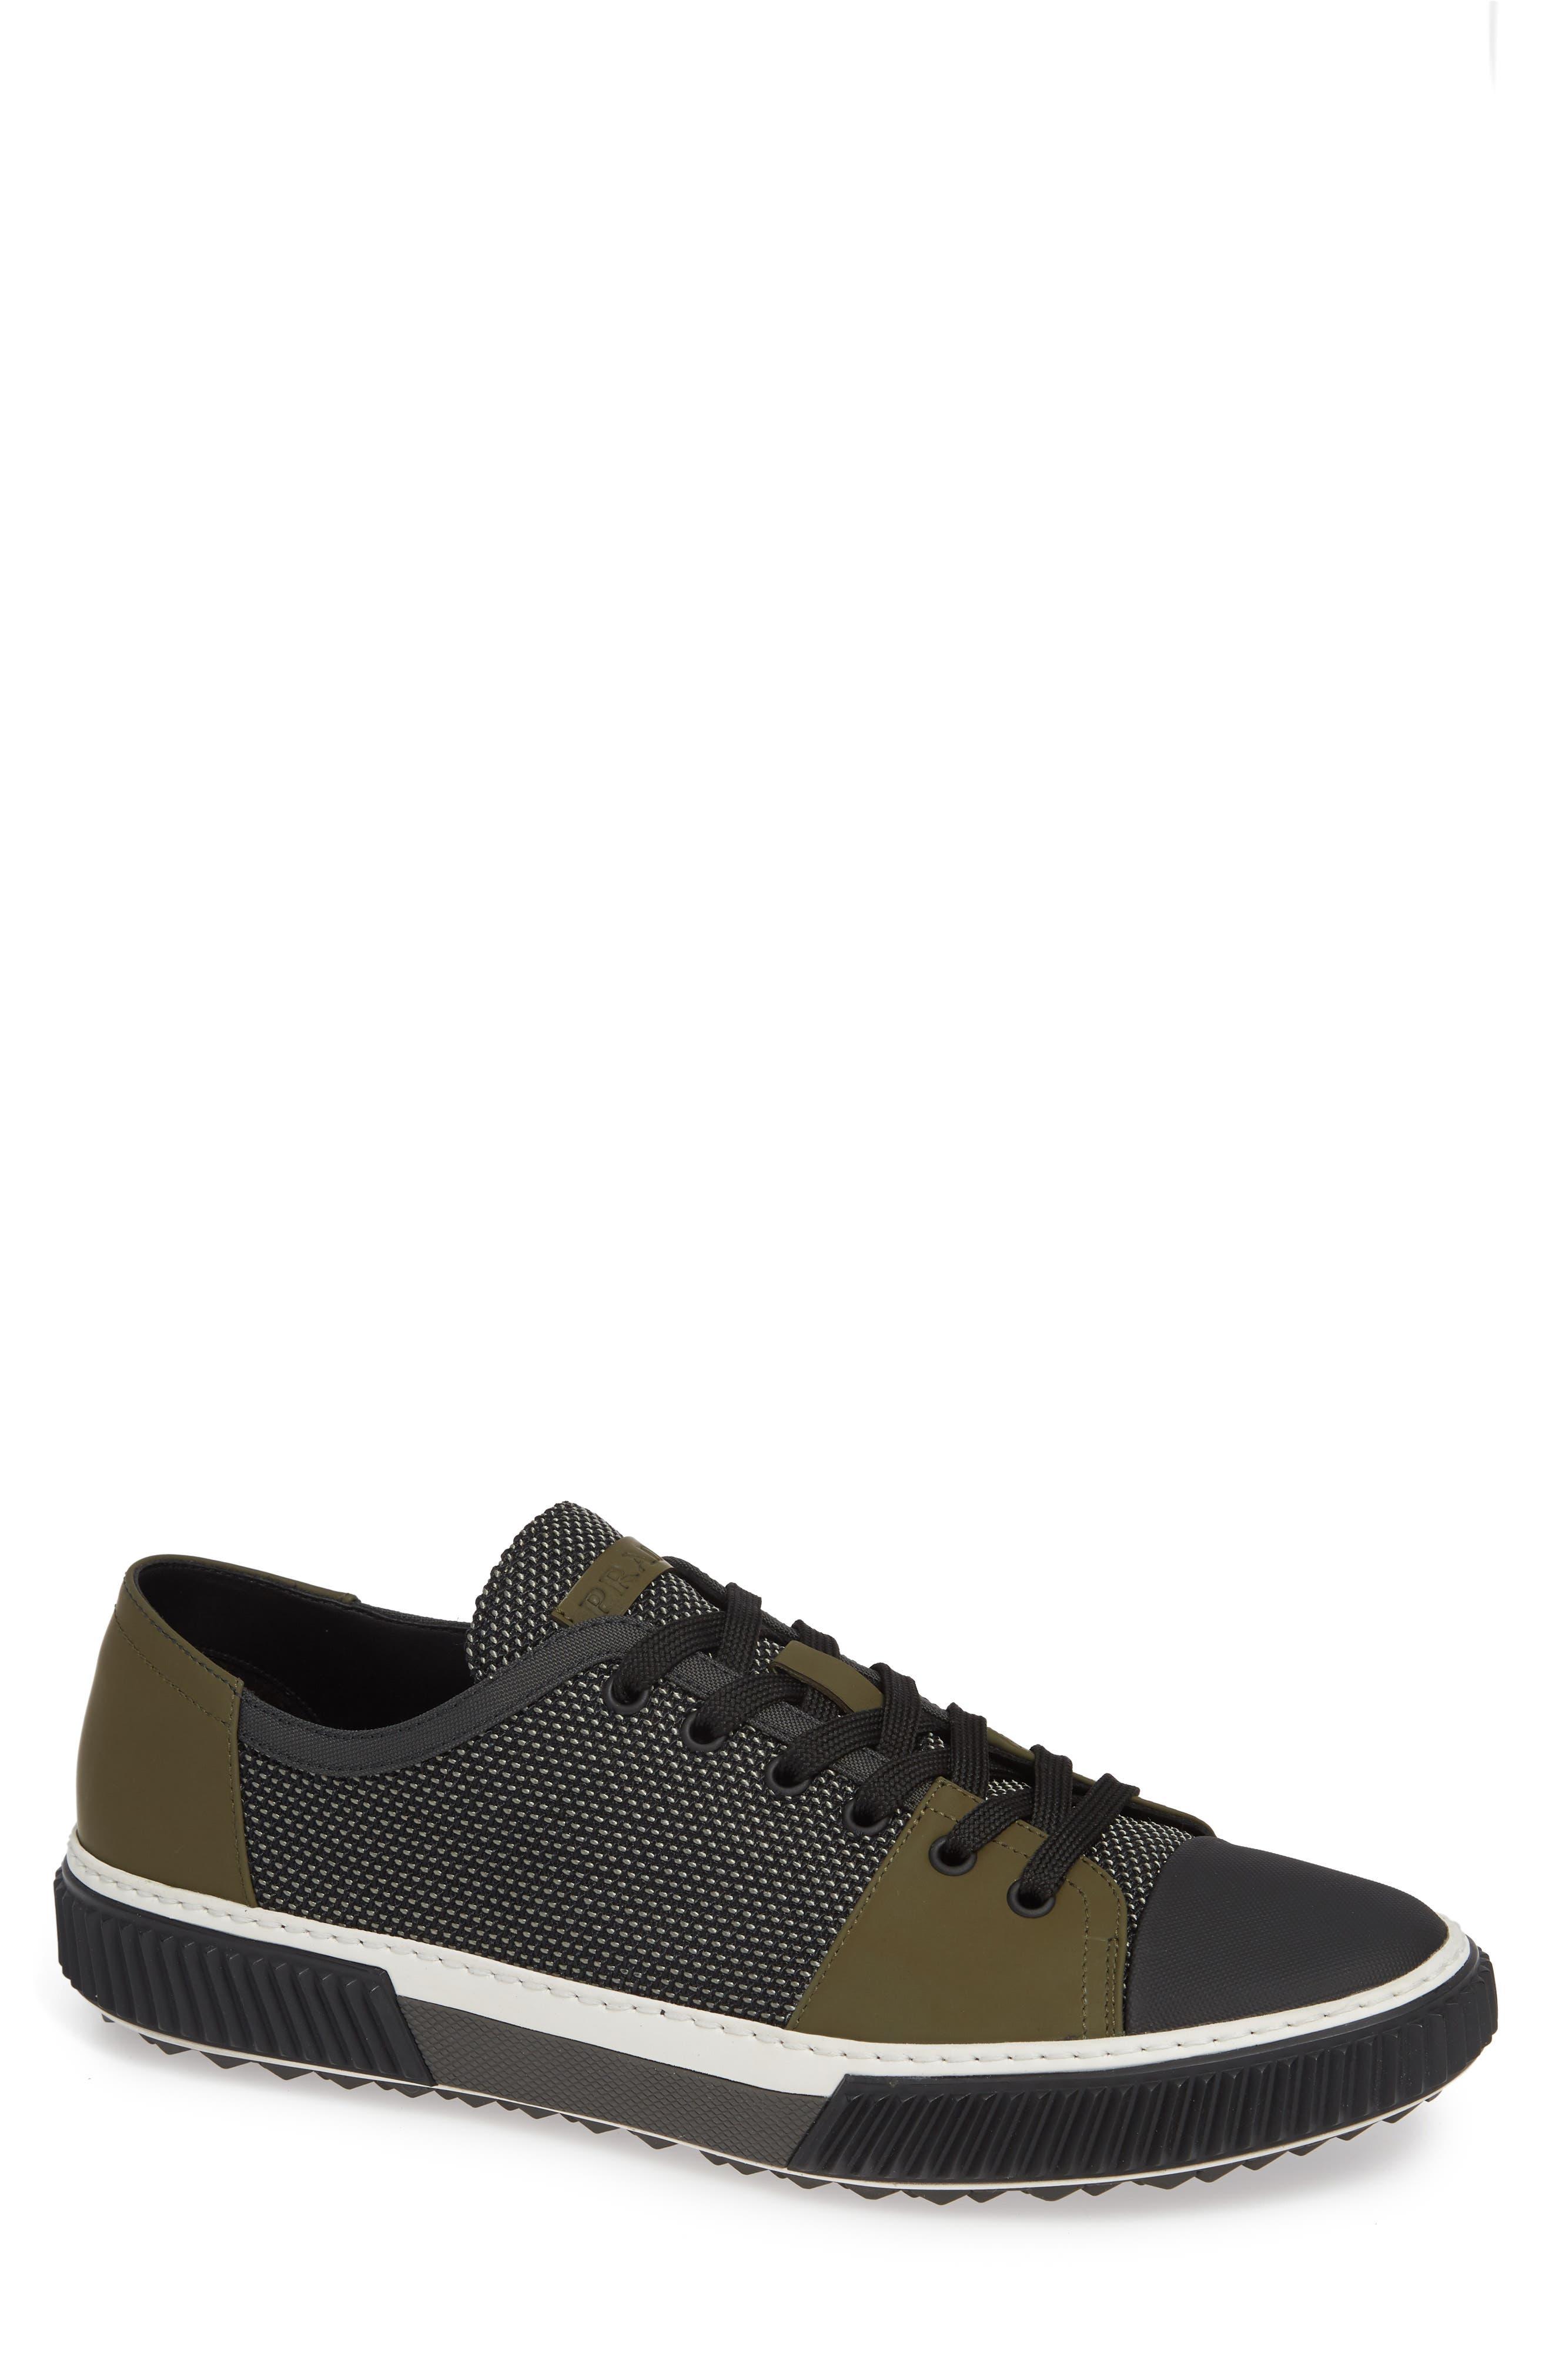 PRADA Linea Rossa Sneaker, Main, color, GREY/ BLACK